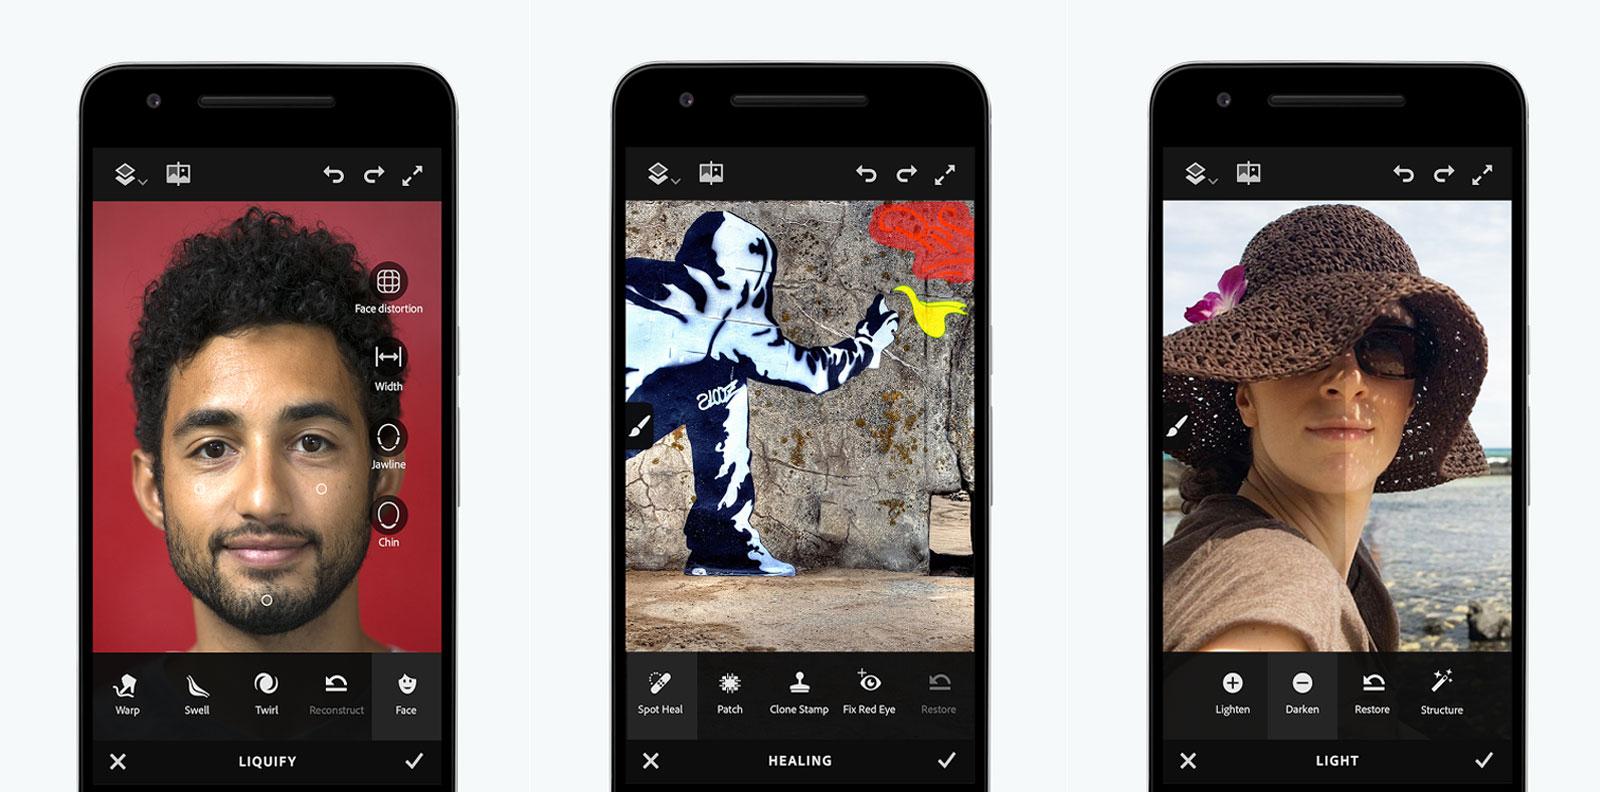 Adobe 的 Photoshop Fix App 终于来到 Android 上